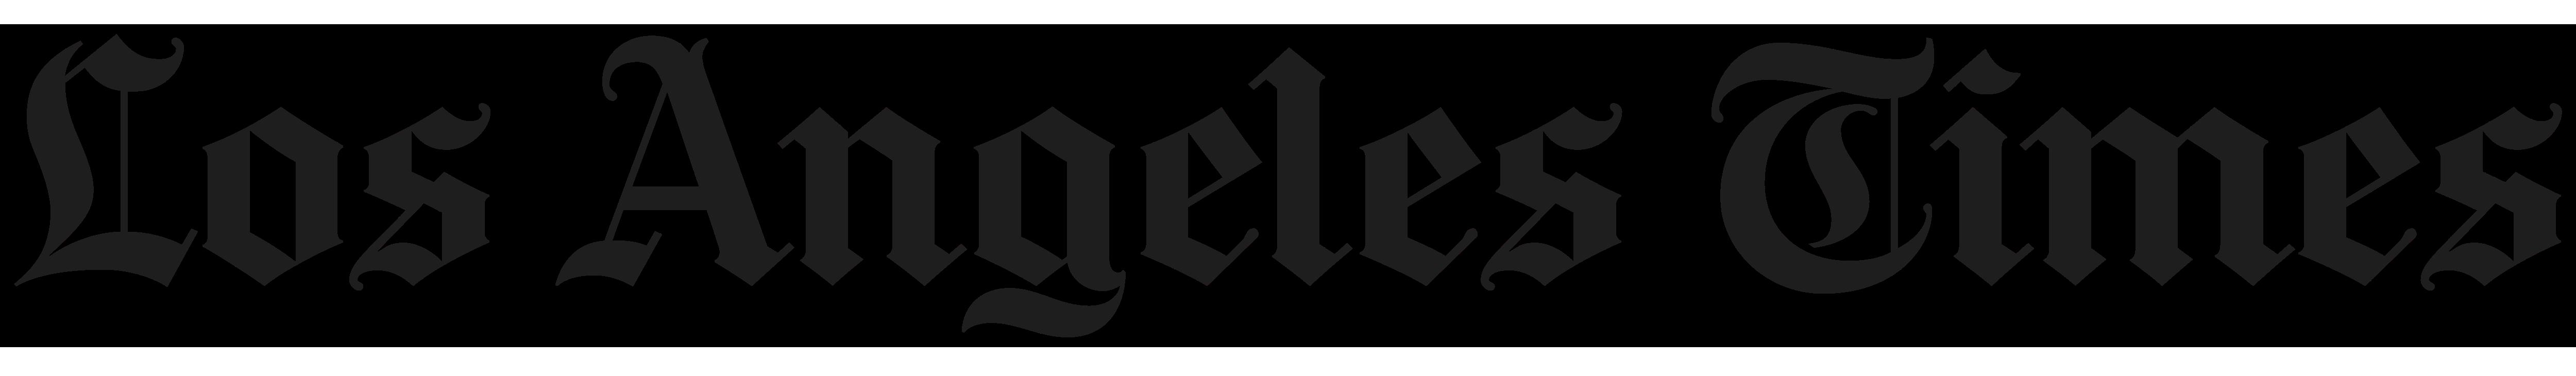 Los_Angeles_Times_logo_wordmark